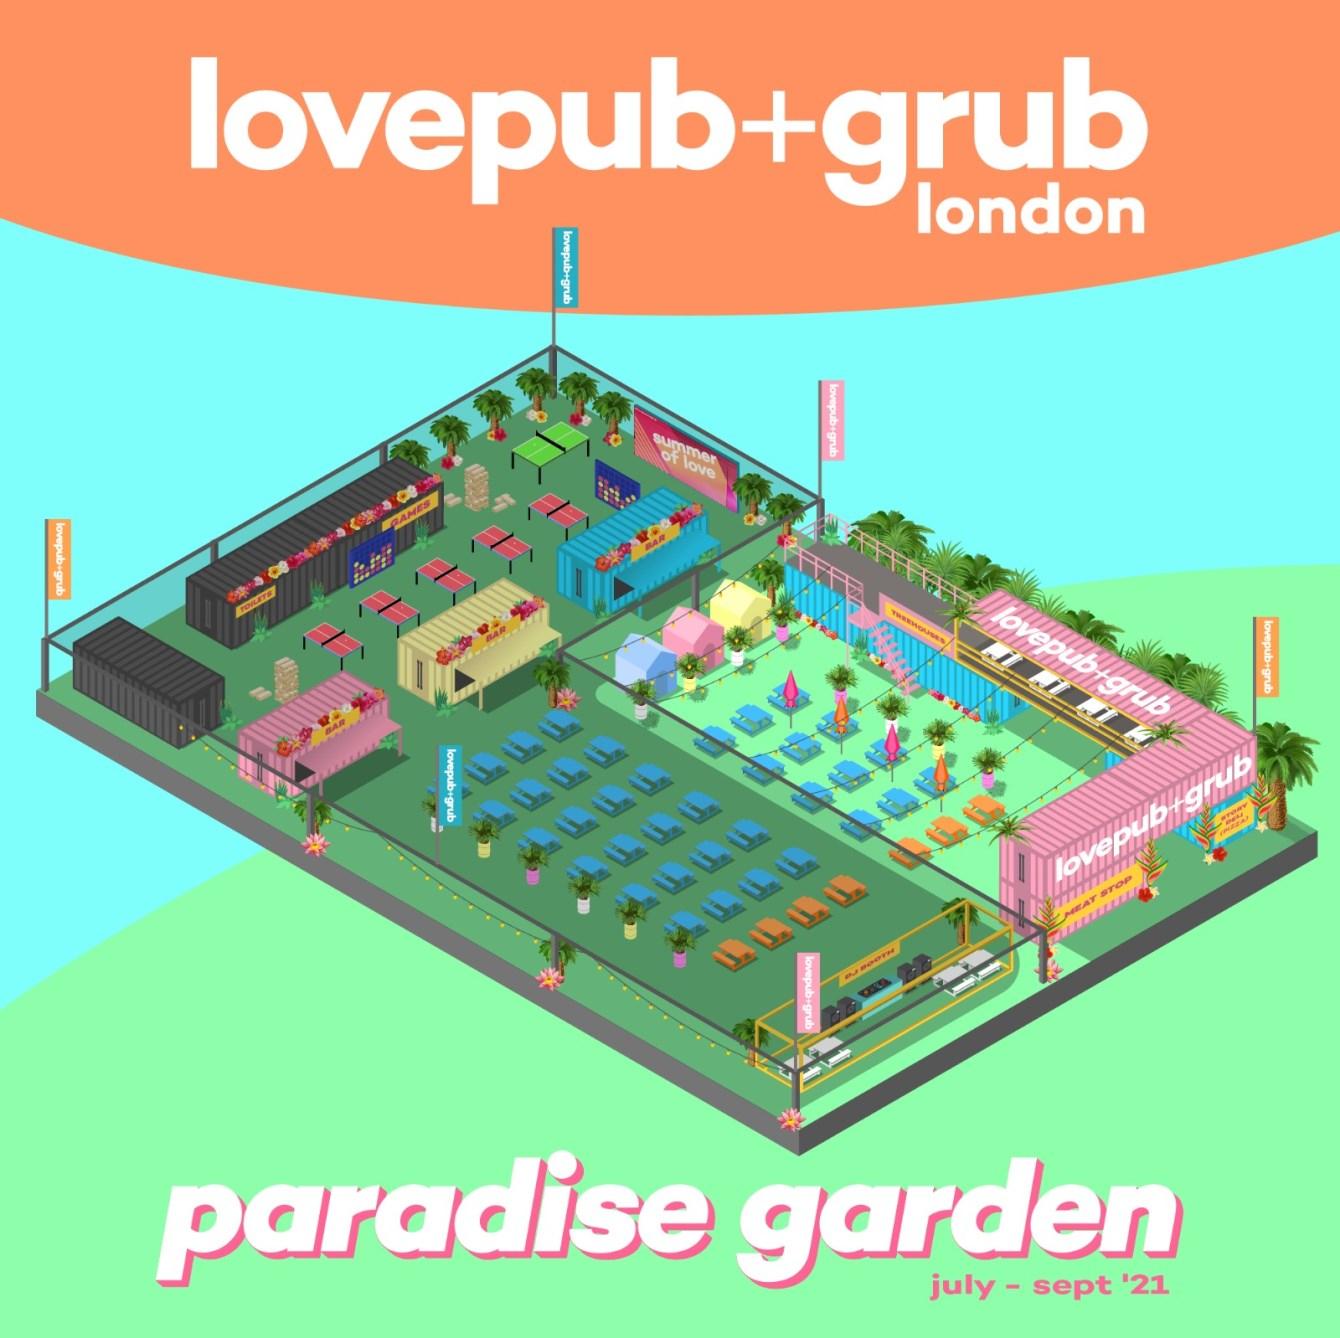 Love Pub & Grub - Sun 1 August - Flyer back